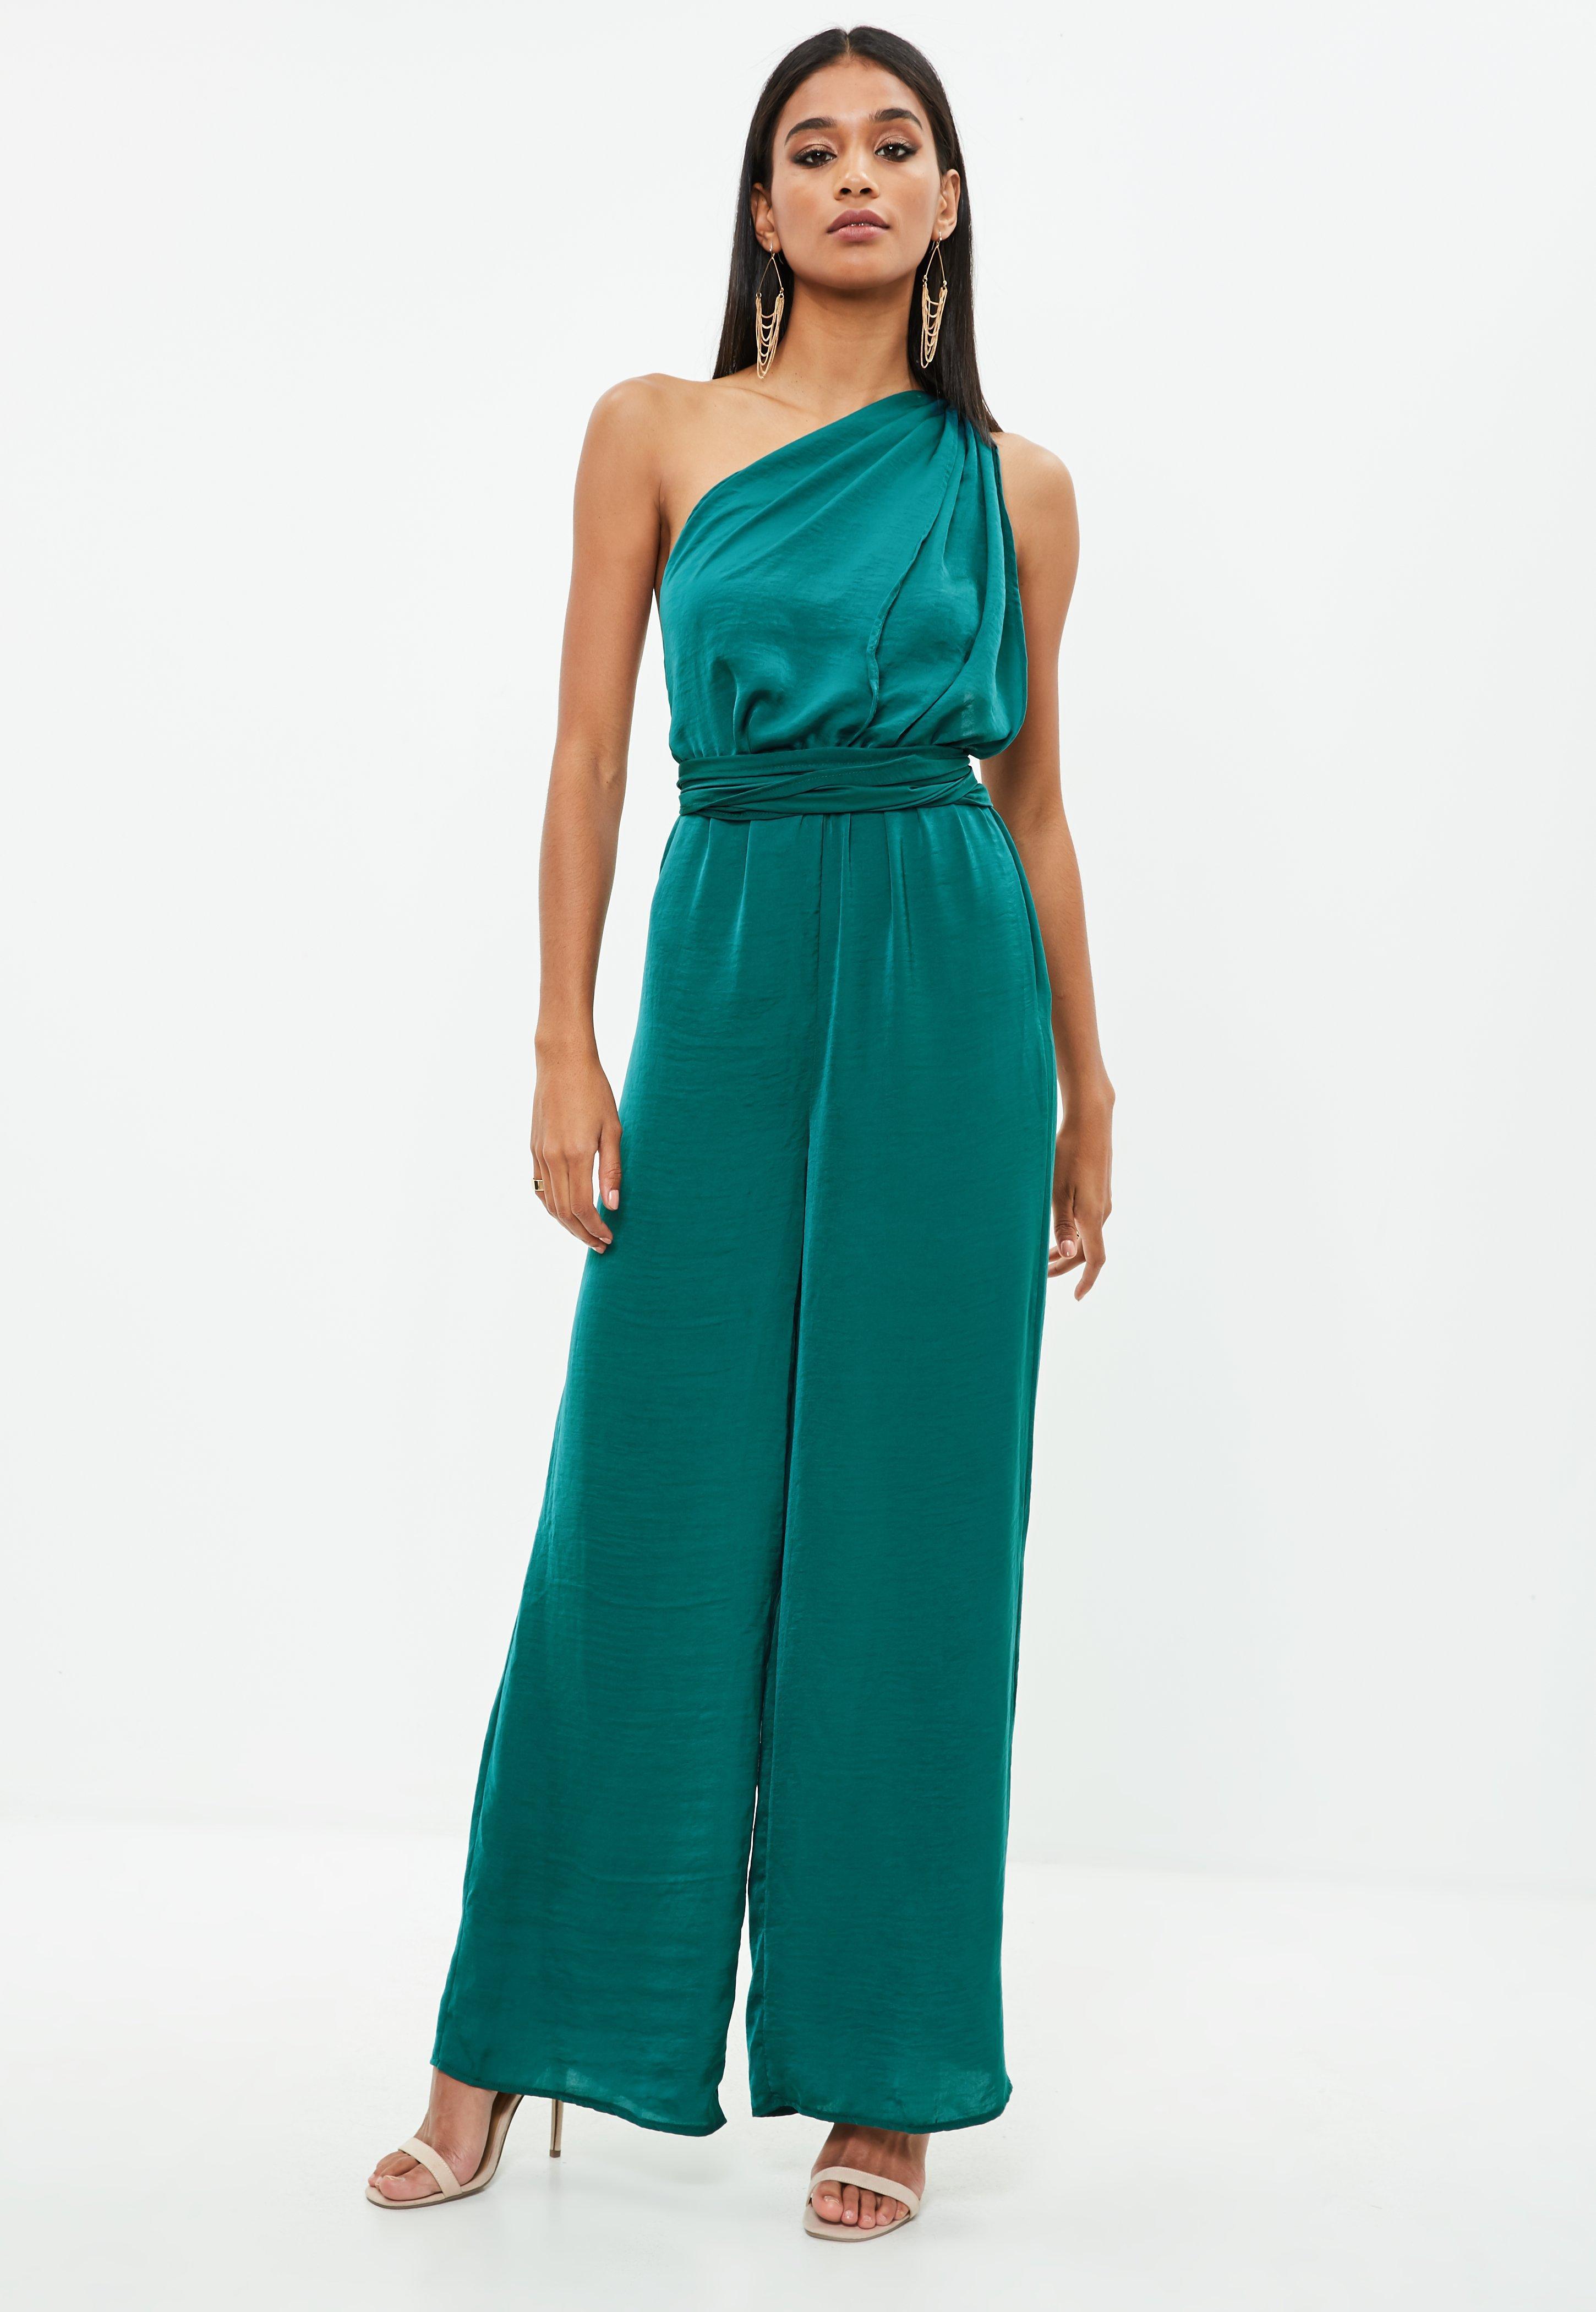 df3f3d0e89 Lyst - Missguided Green Satin Multi Way Wide Leg Jumpsuit in Green